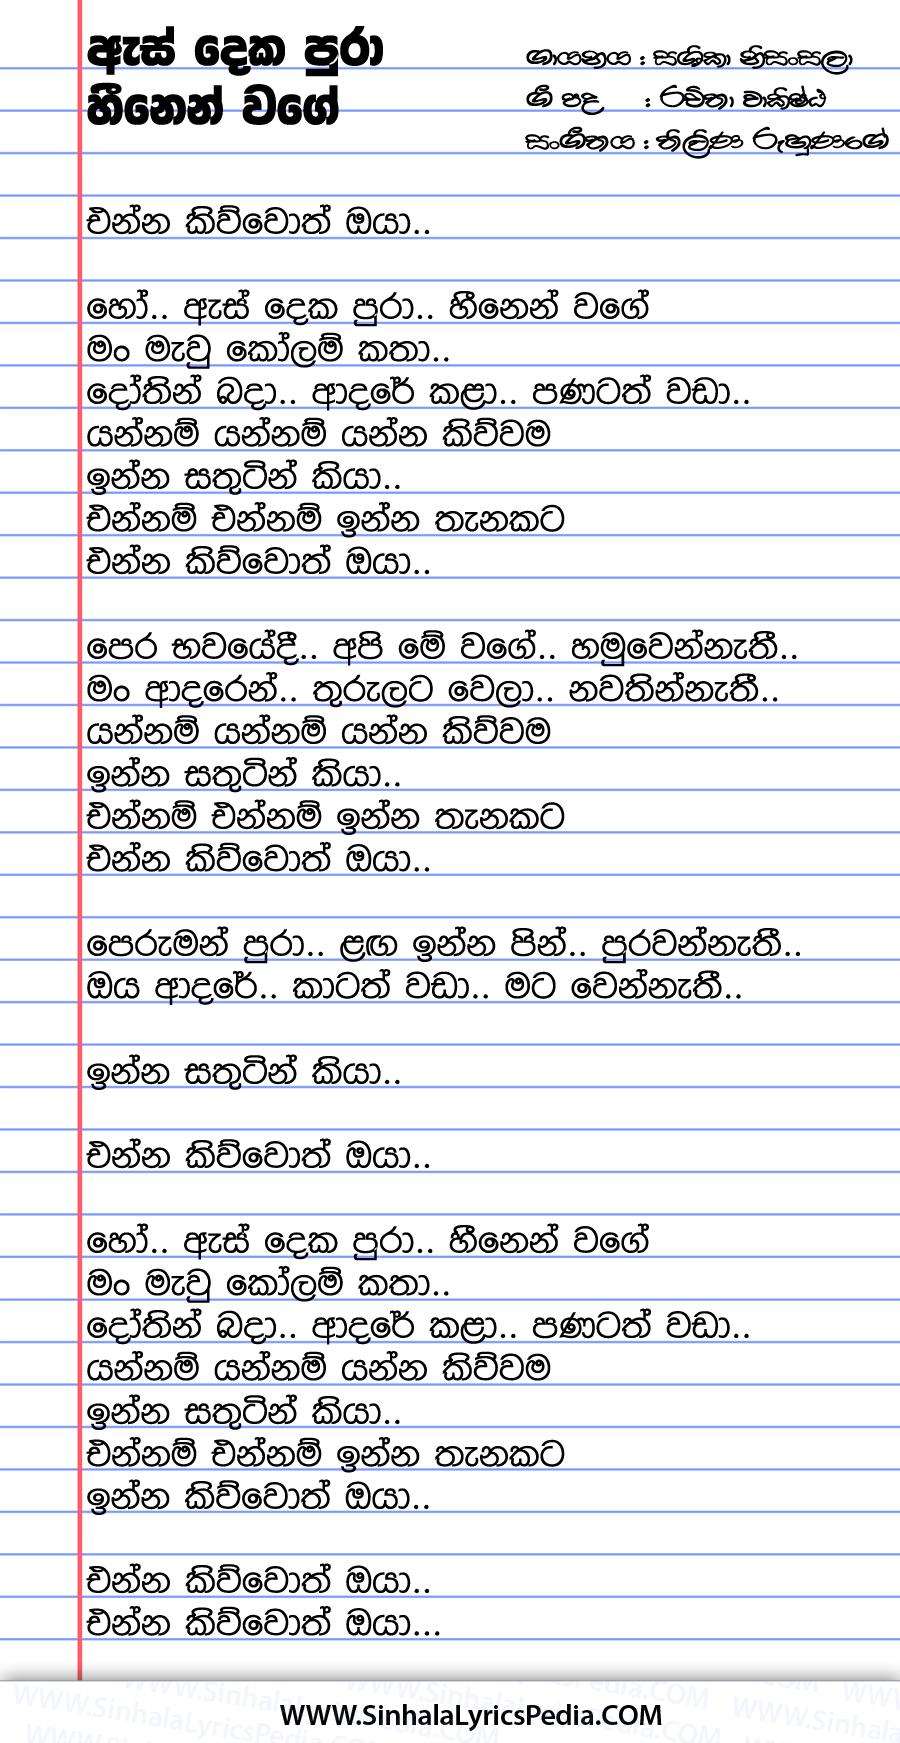 Es Deka Pura Heenen Wage (Yannam Yannam) Song Lyrics